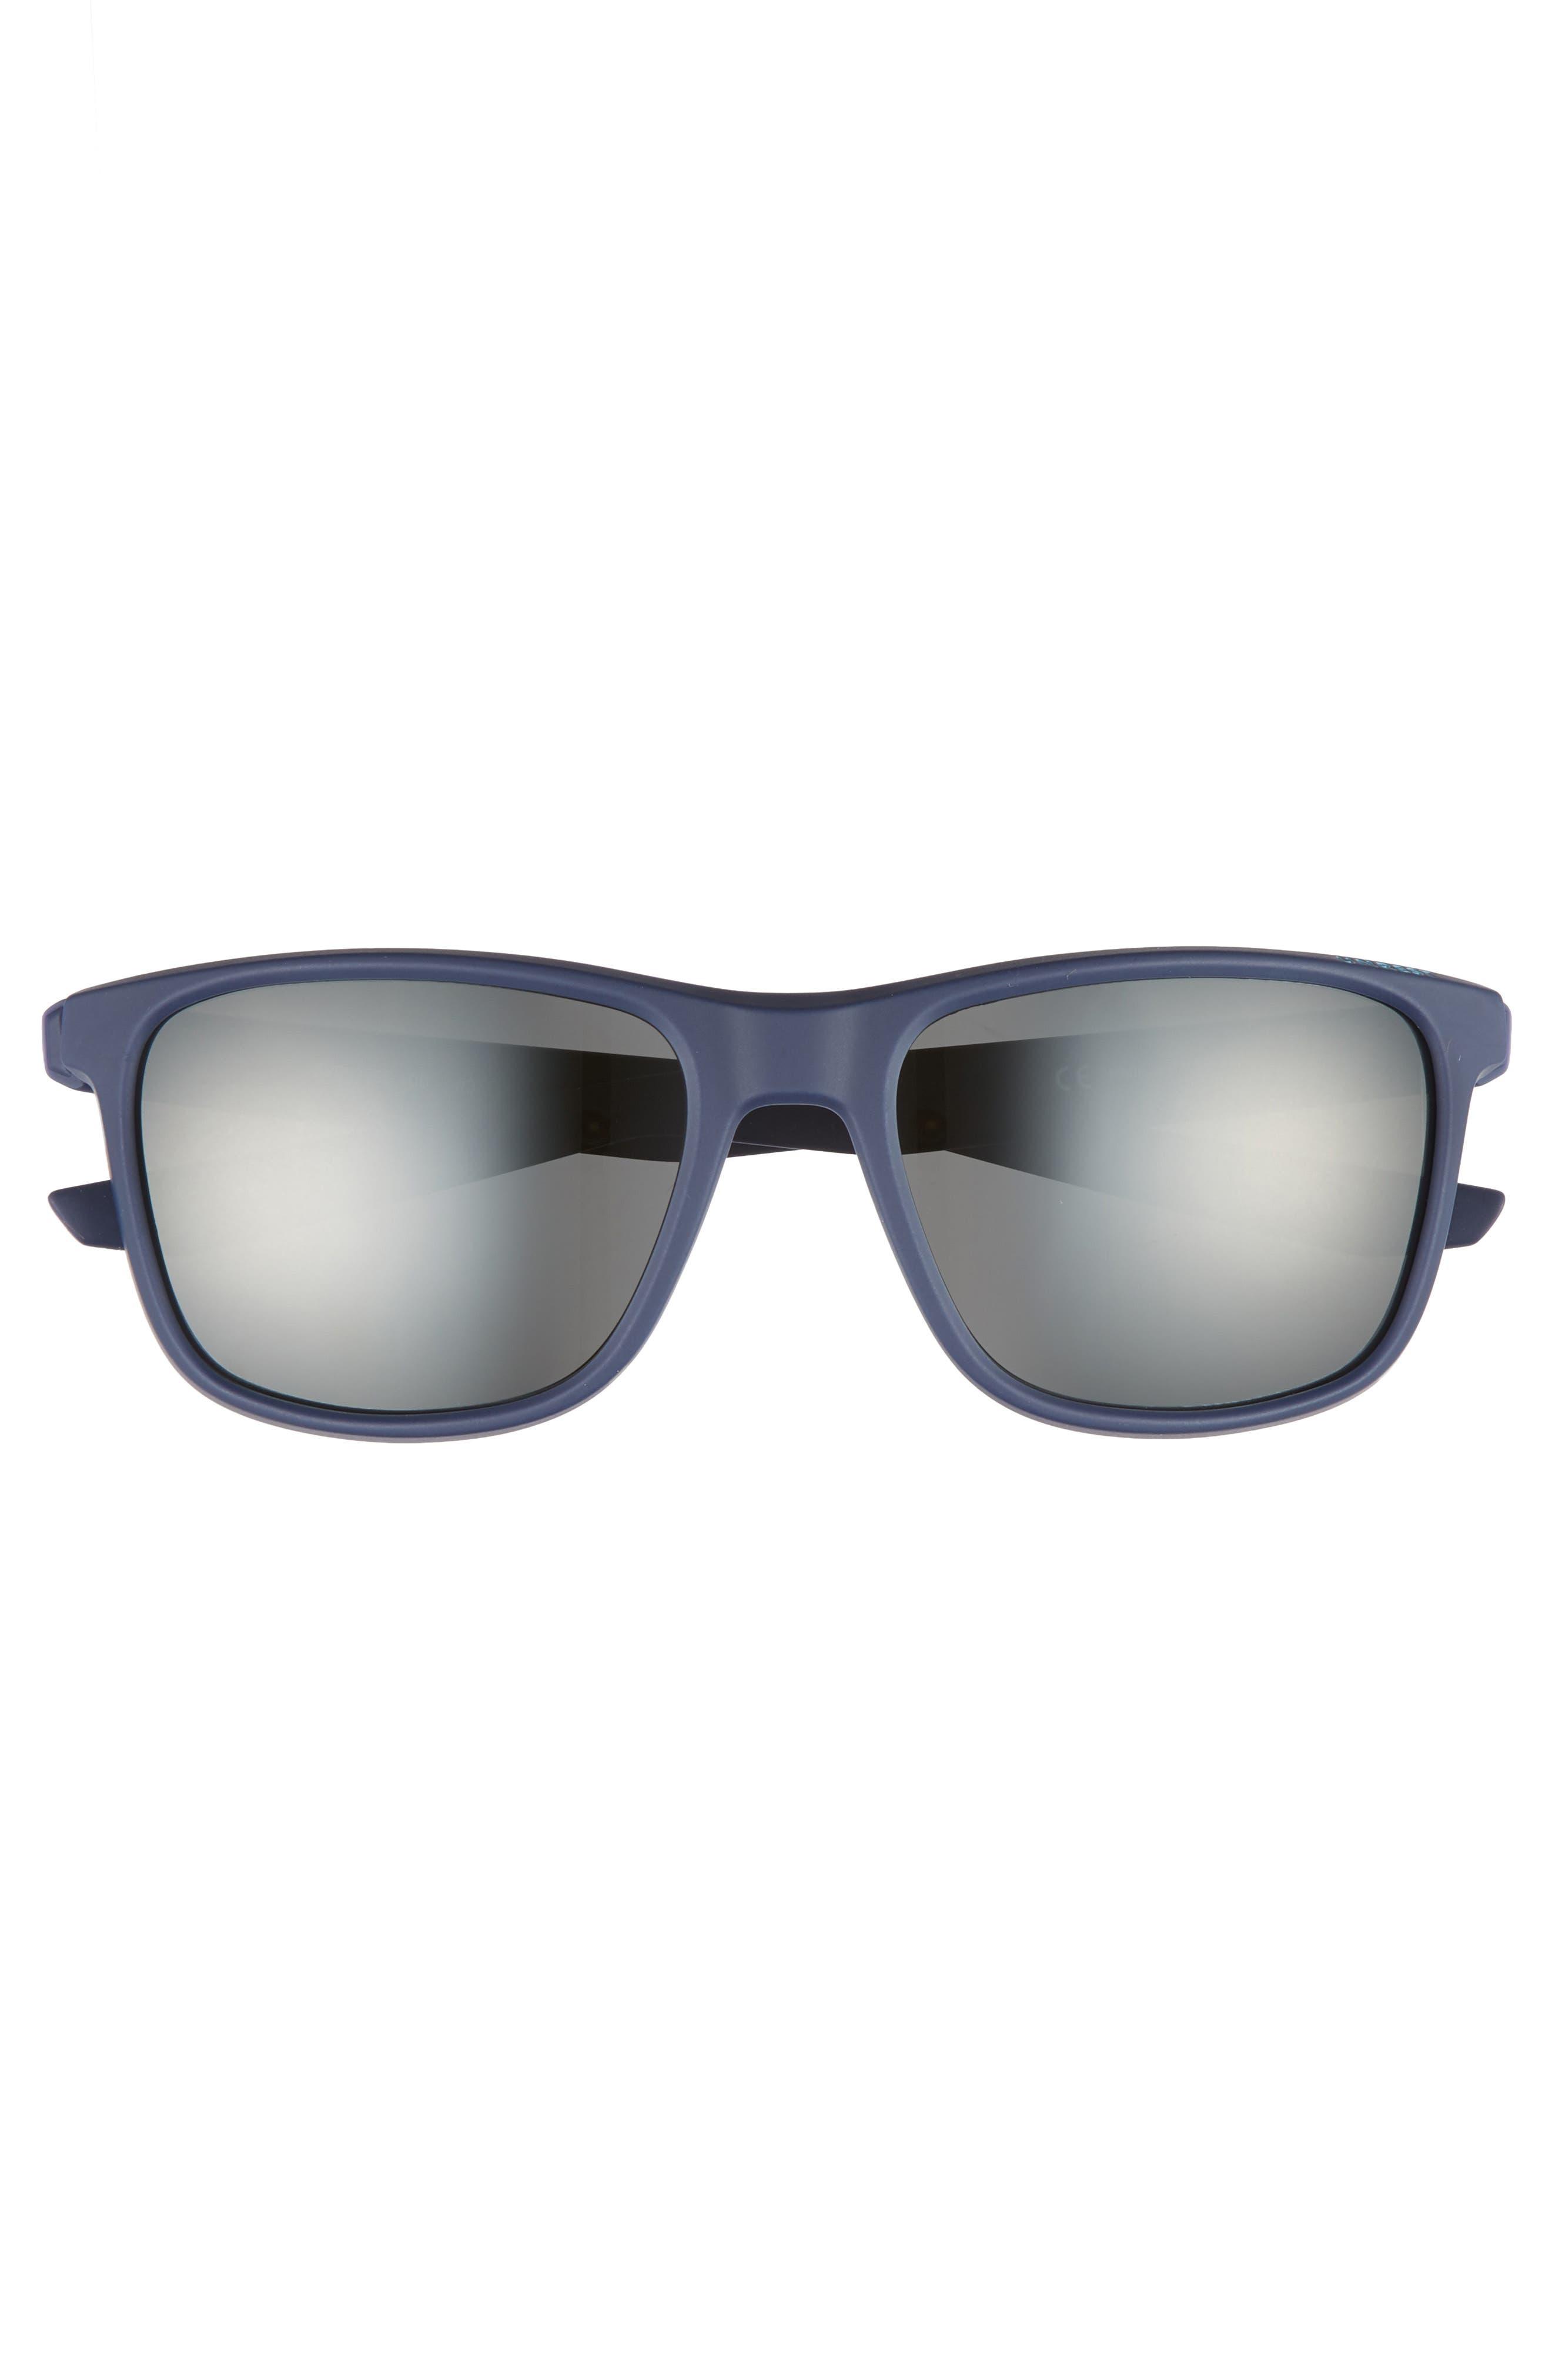 Unrest SE 57mm Sunglasses,                             Alternate thumbnail 2, color,                             Midnight Teal/ Dark Grey